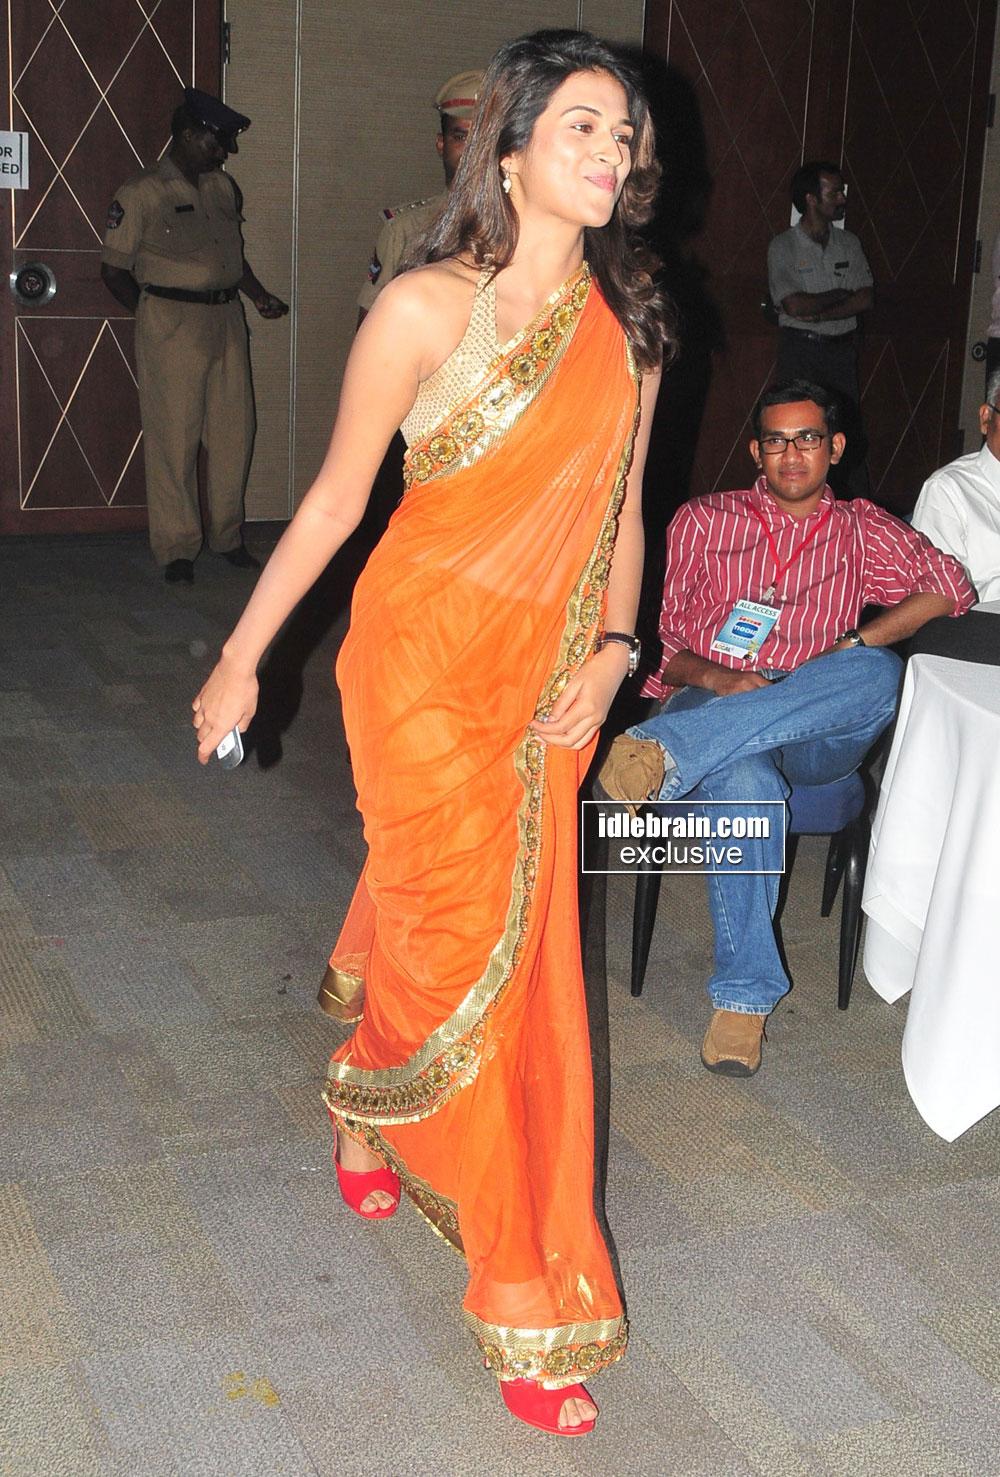 Anjana Anjani Movie Songs Download - SongsPk Mp3